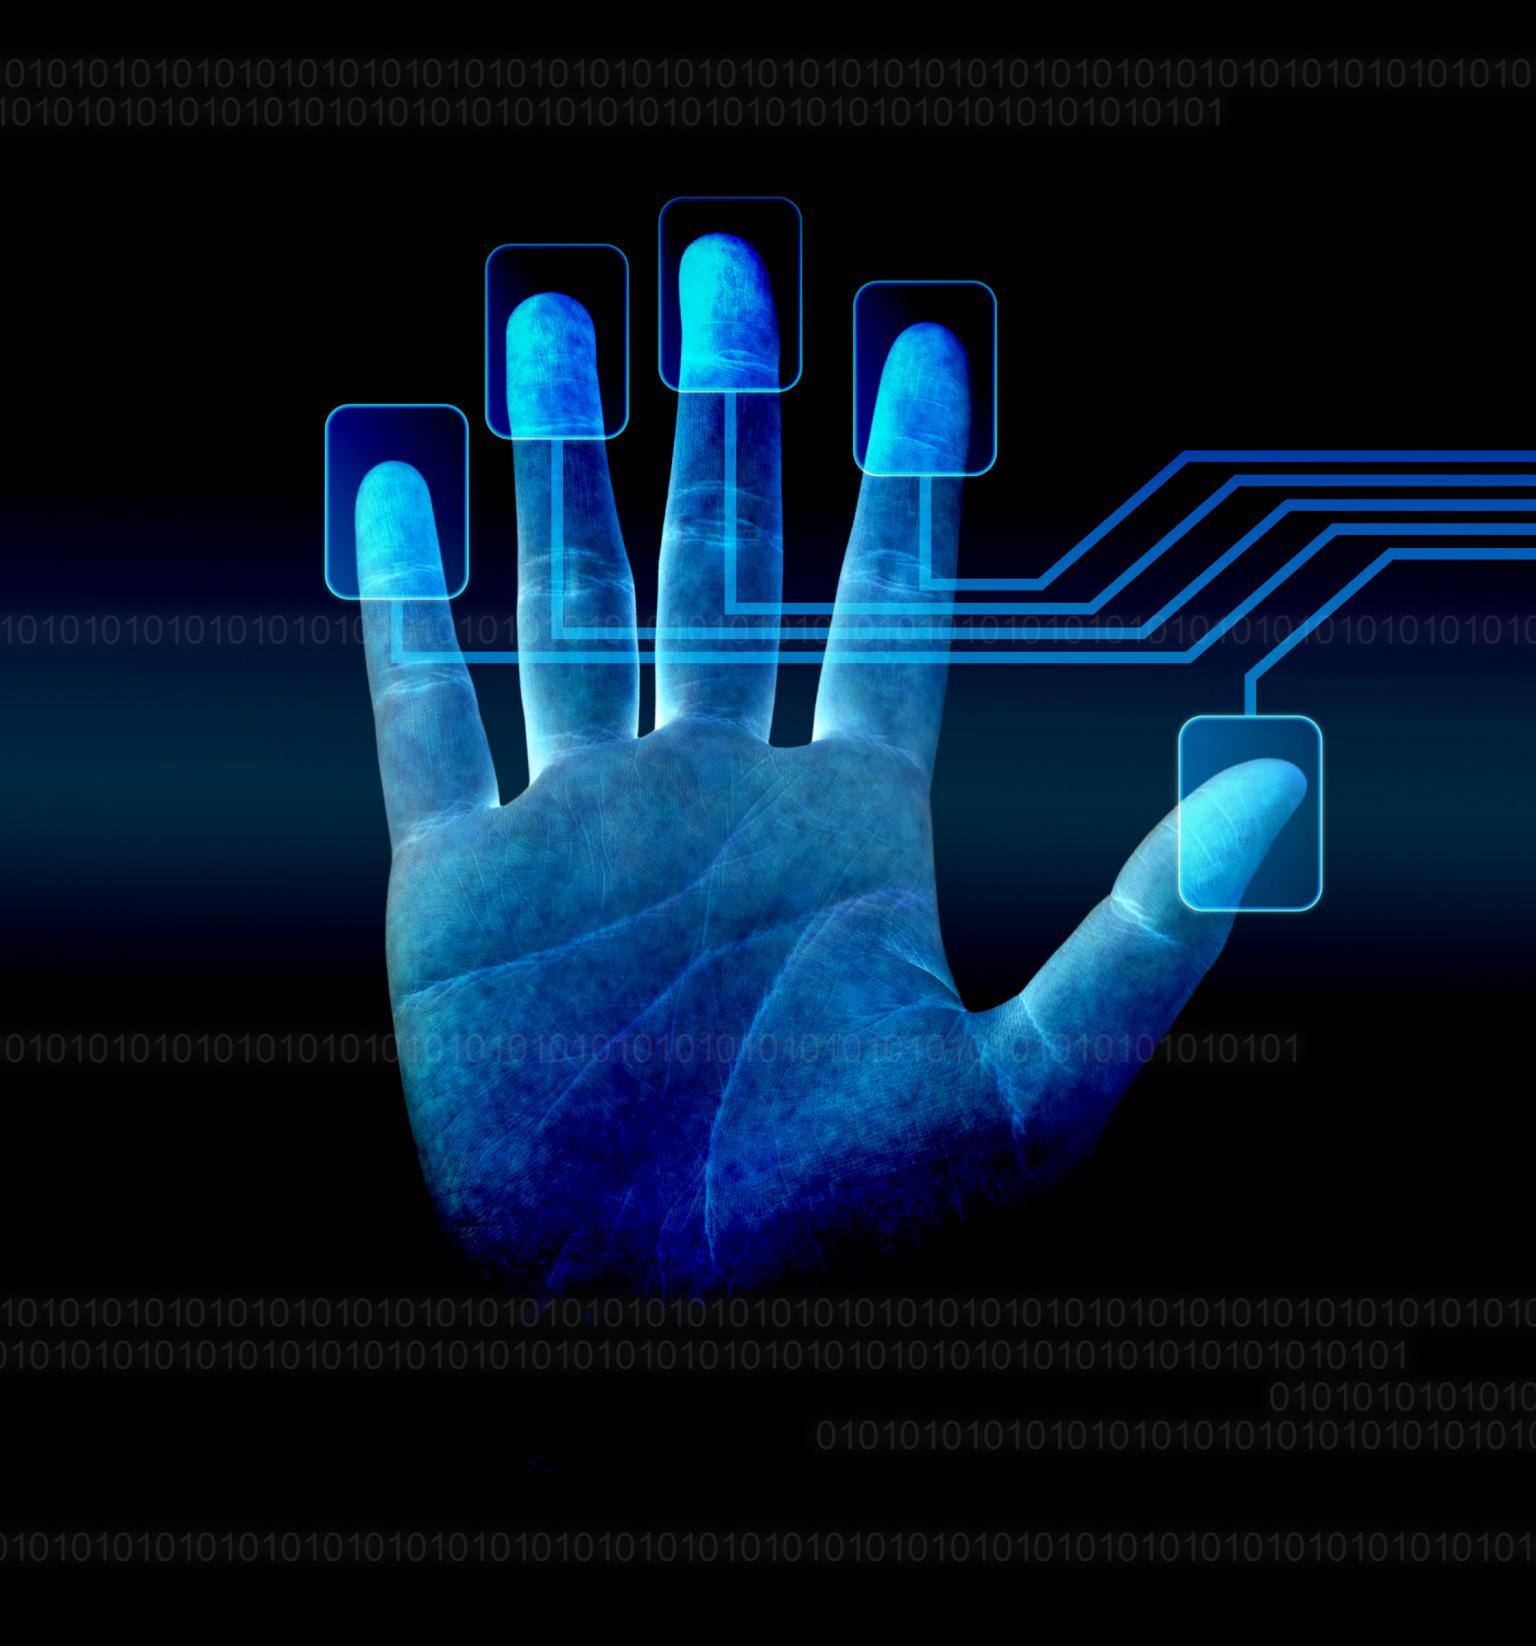 EMKA BioLock – biometric security for server cabinets